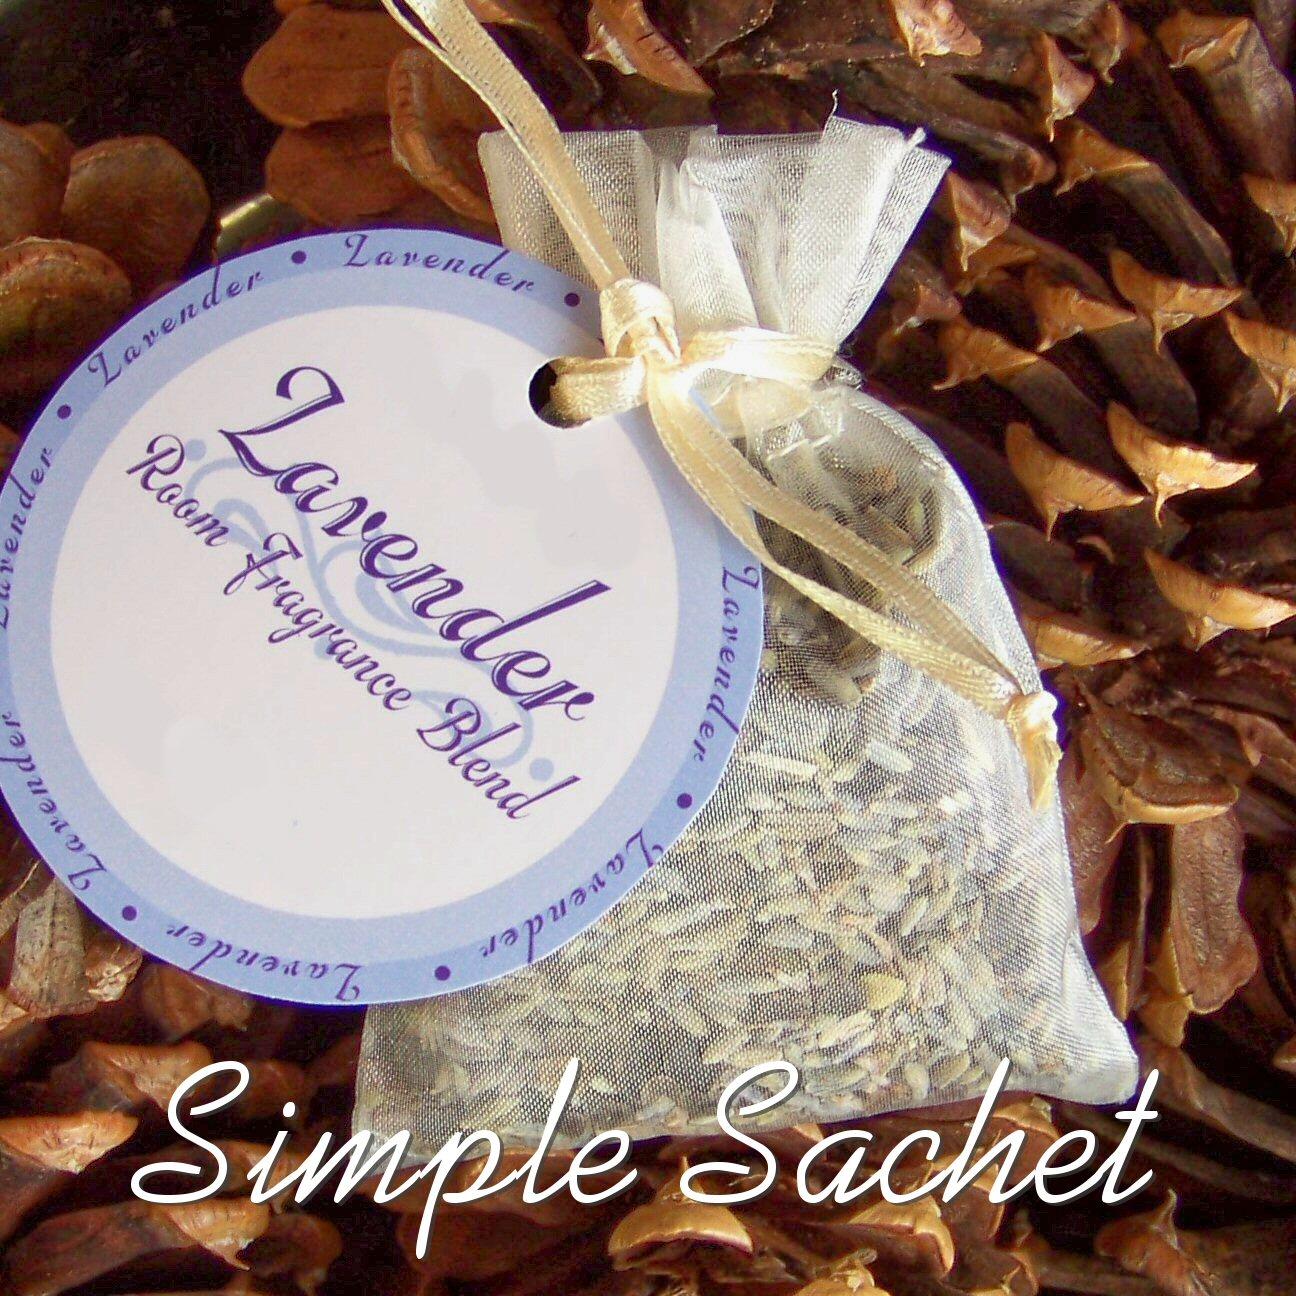 How to Make a Simple Sachet | Sharrie Lynn Design